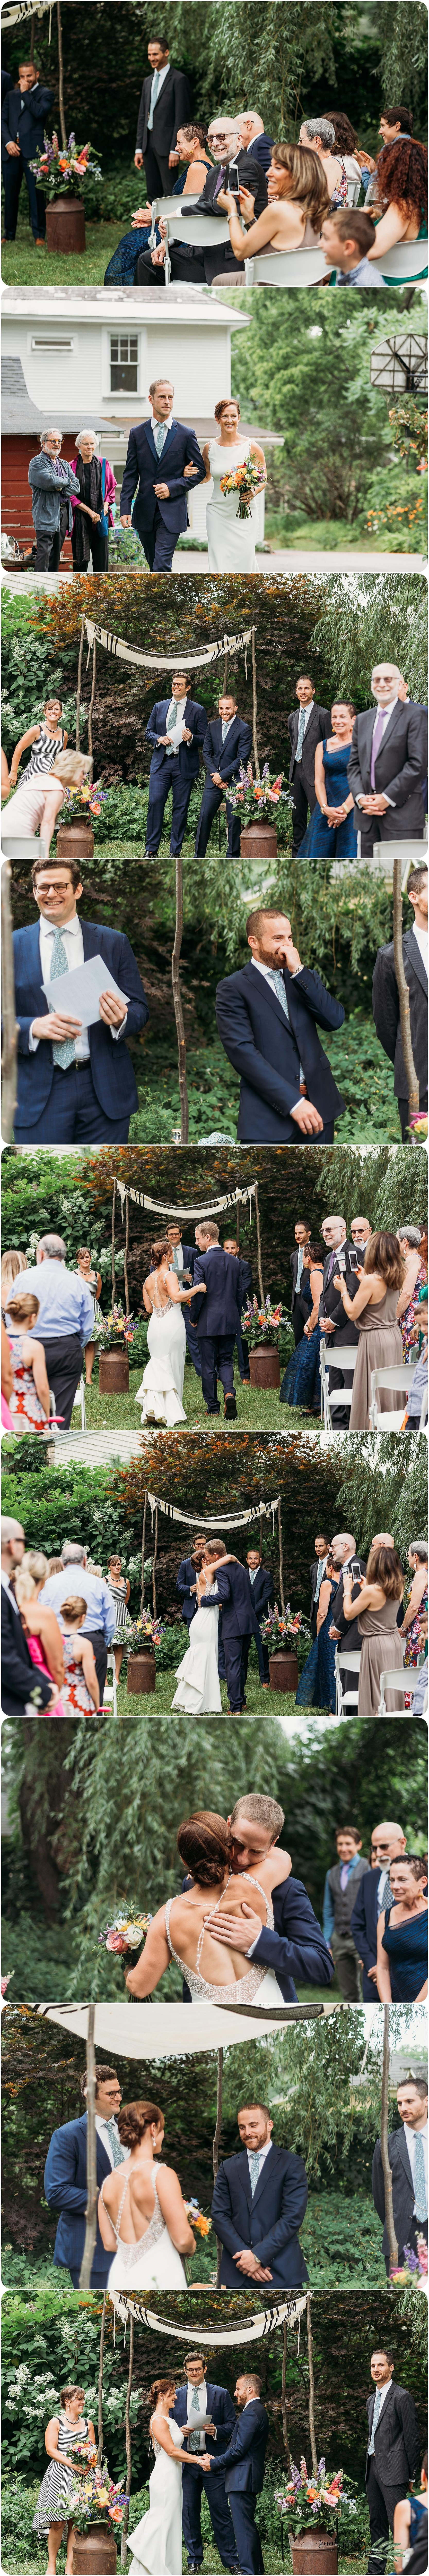 Vermont Backyard Wedding